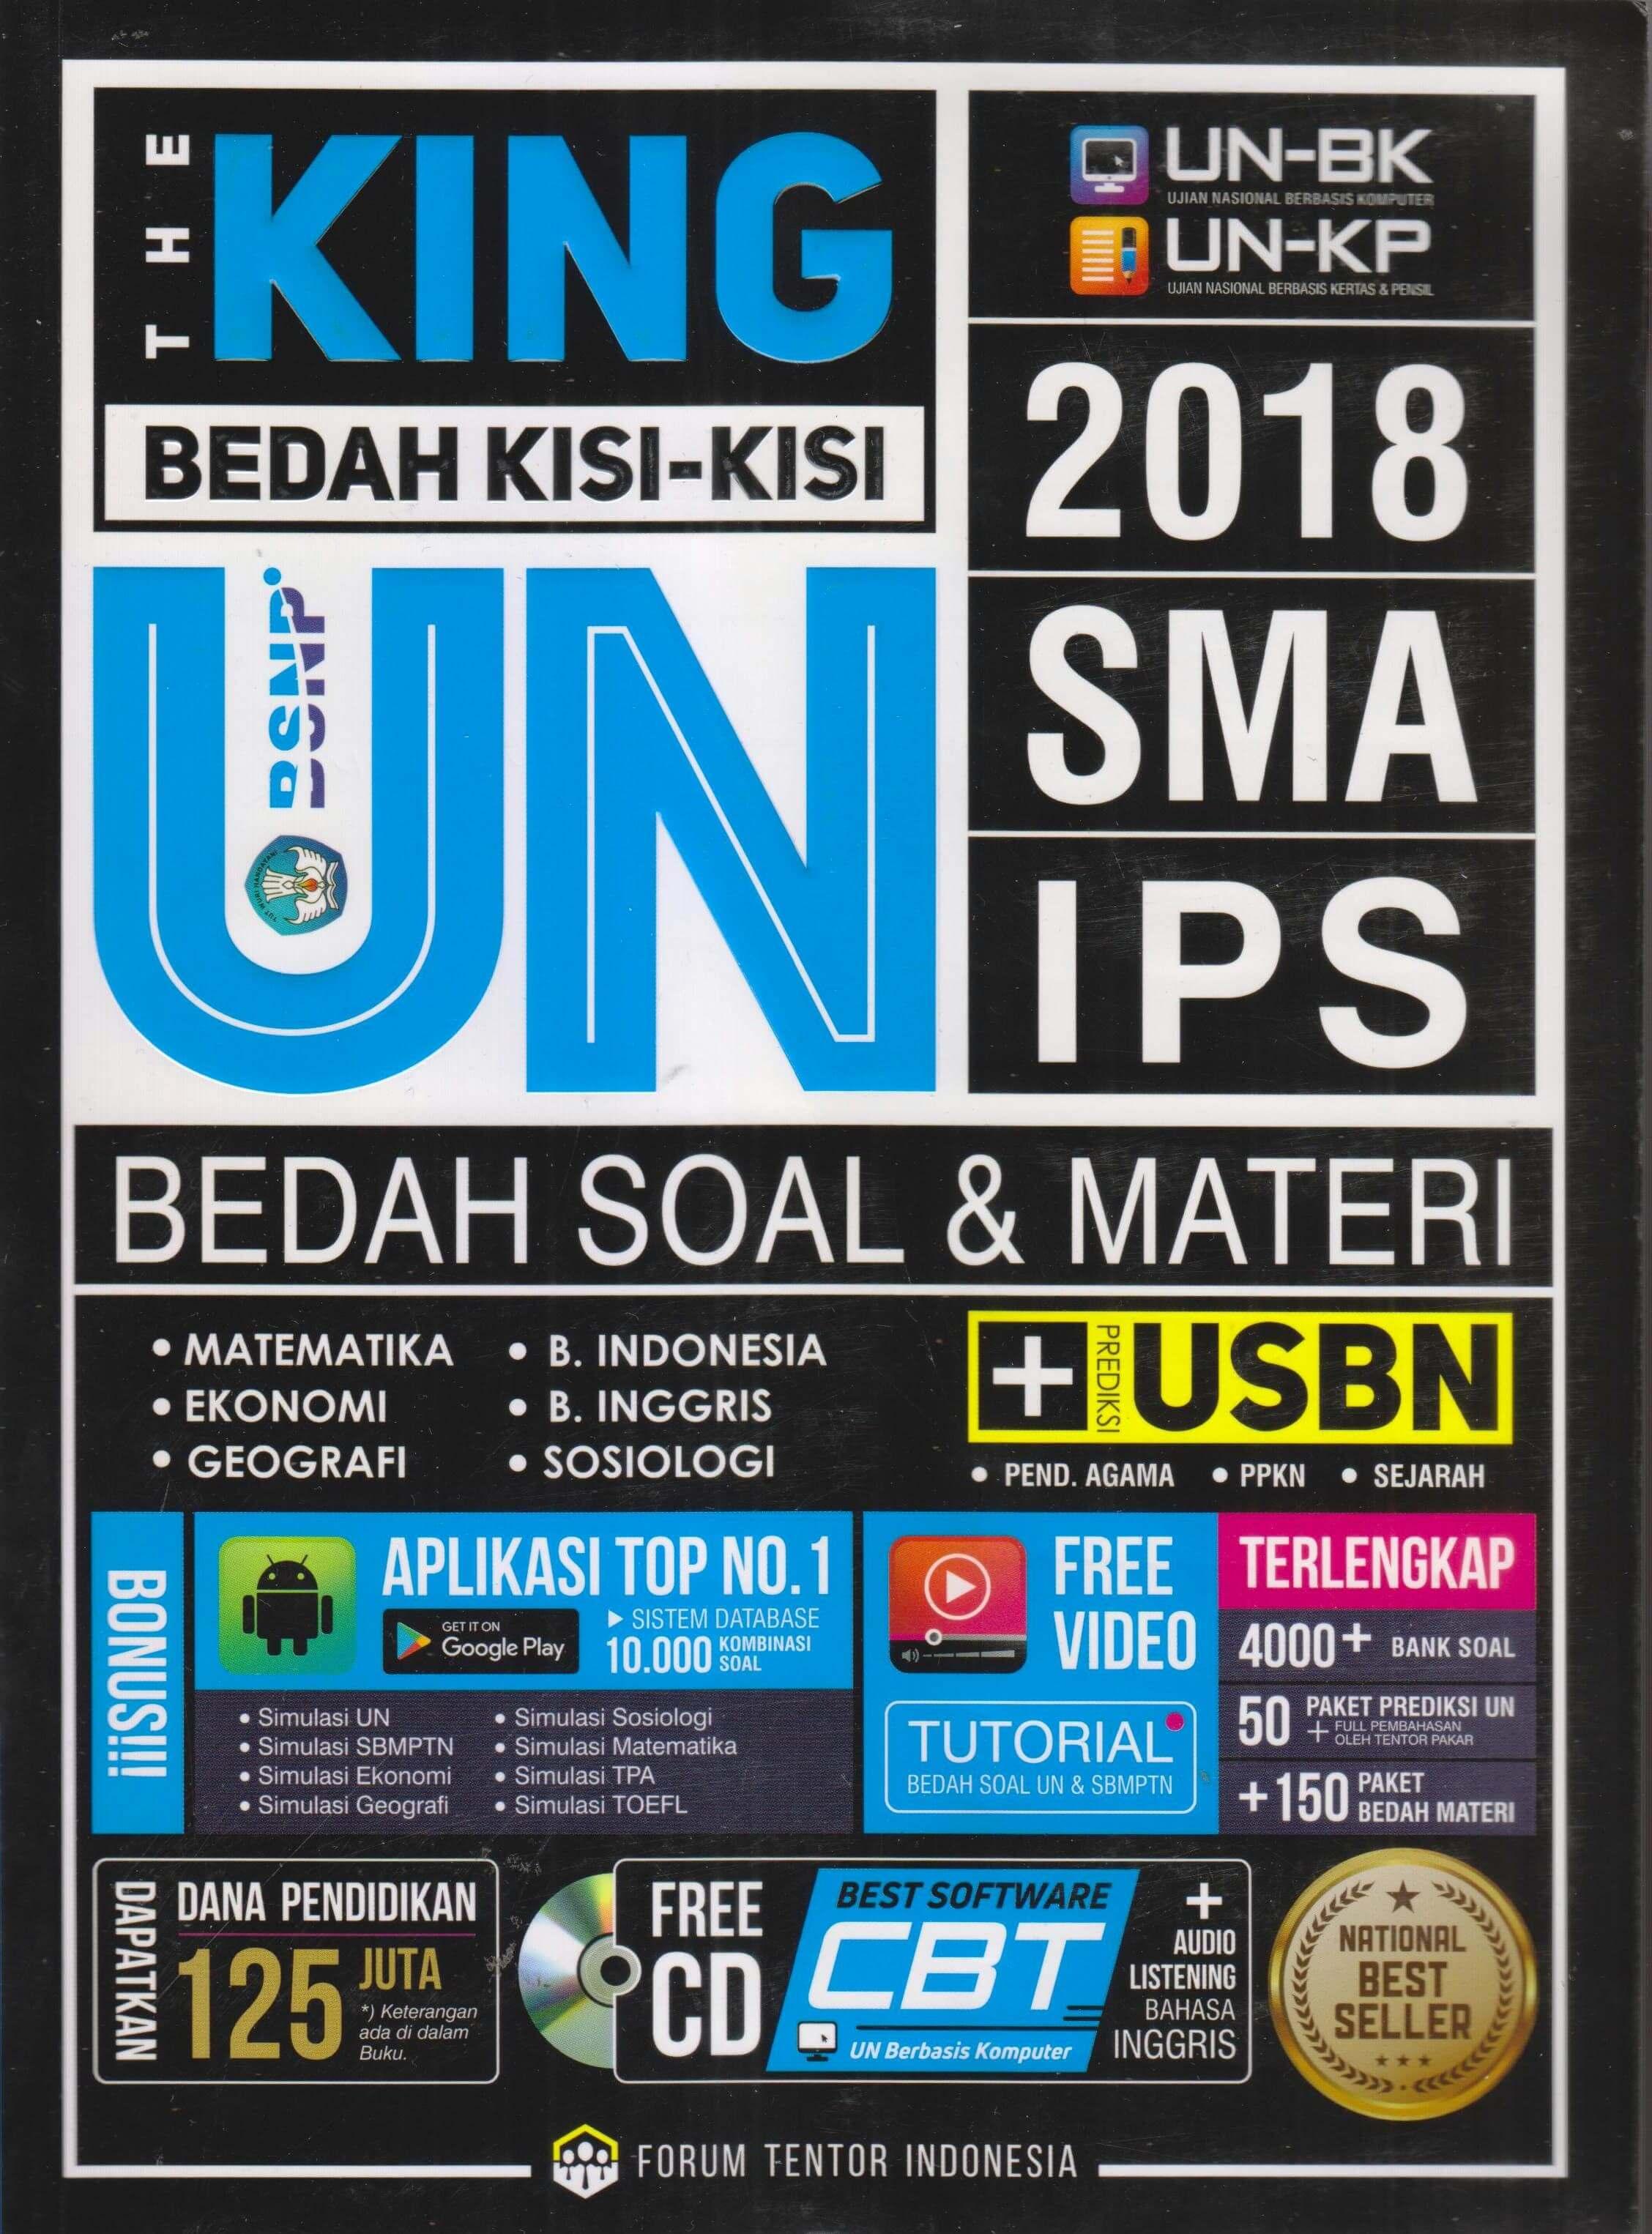 BEDAH KISI2 UN SMA IPS 2018: THE KINGen